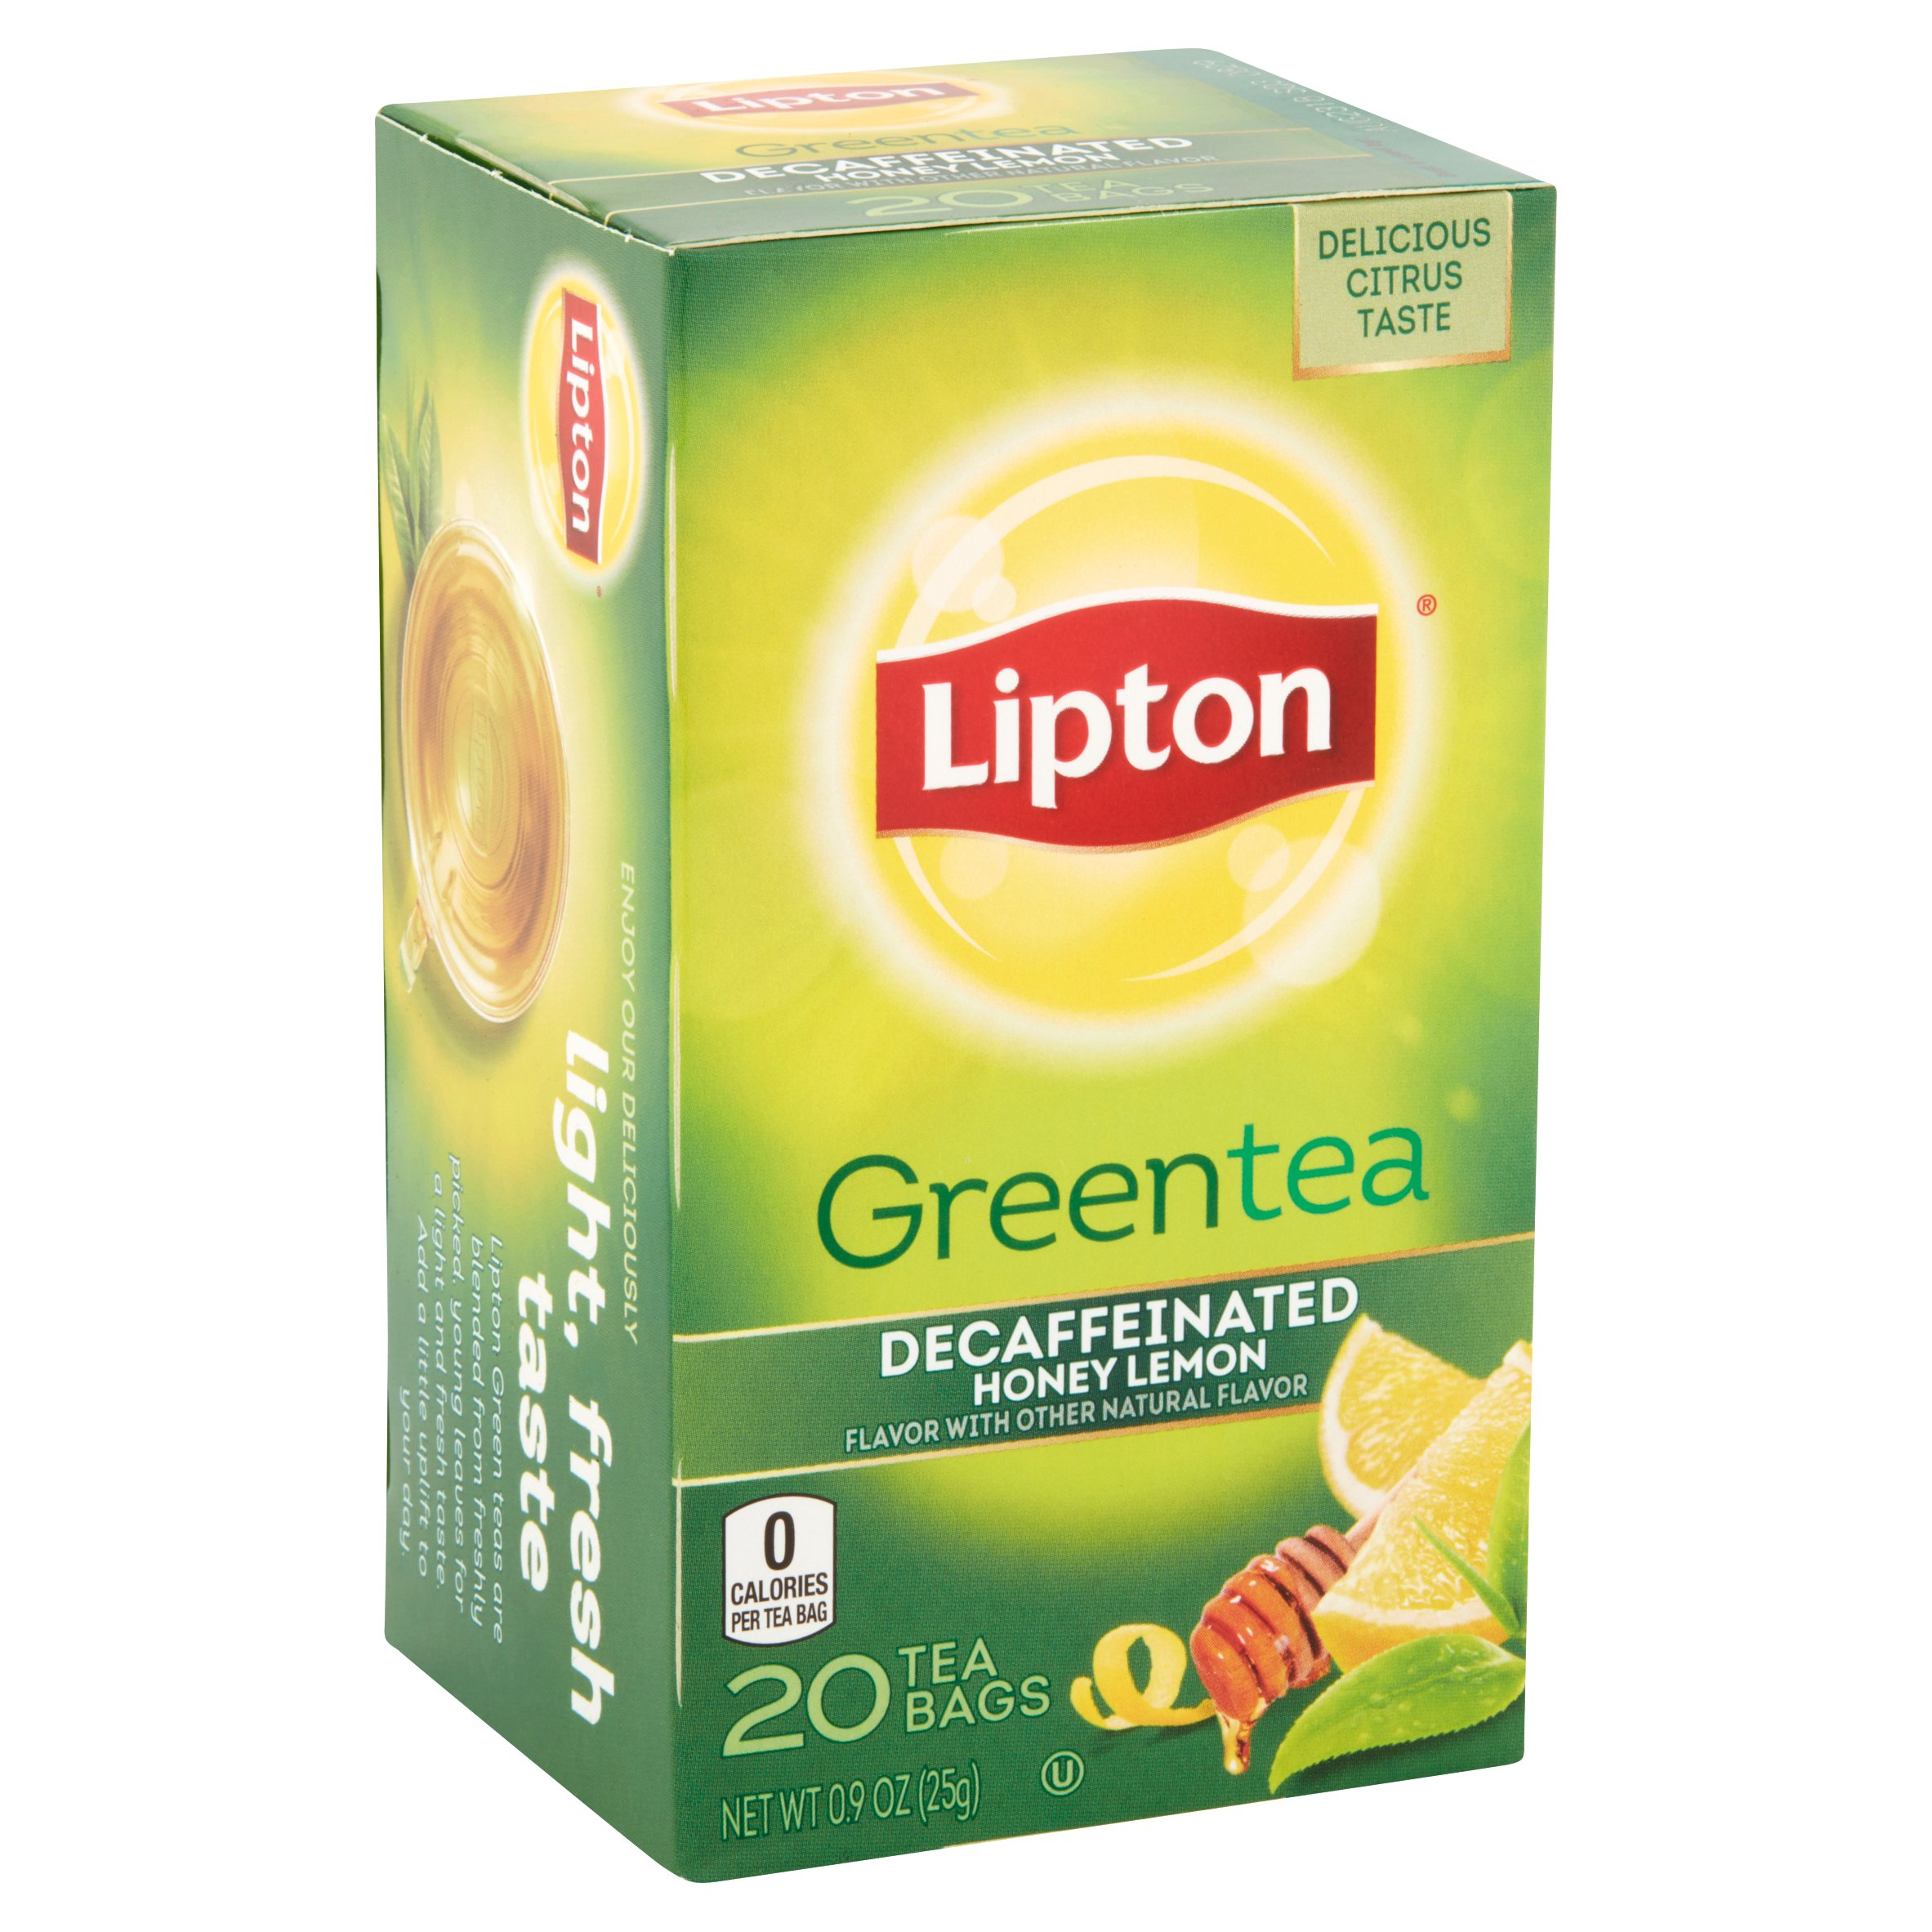 lipton greentea honey lemon tea bags 20 count 09 oz walmartcom